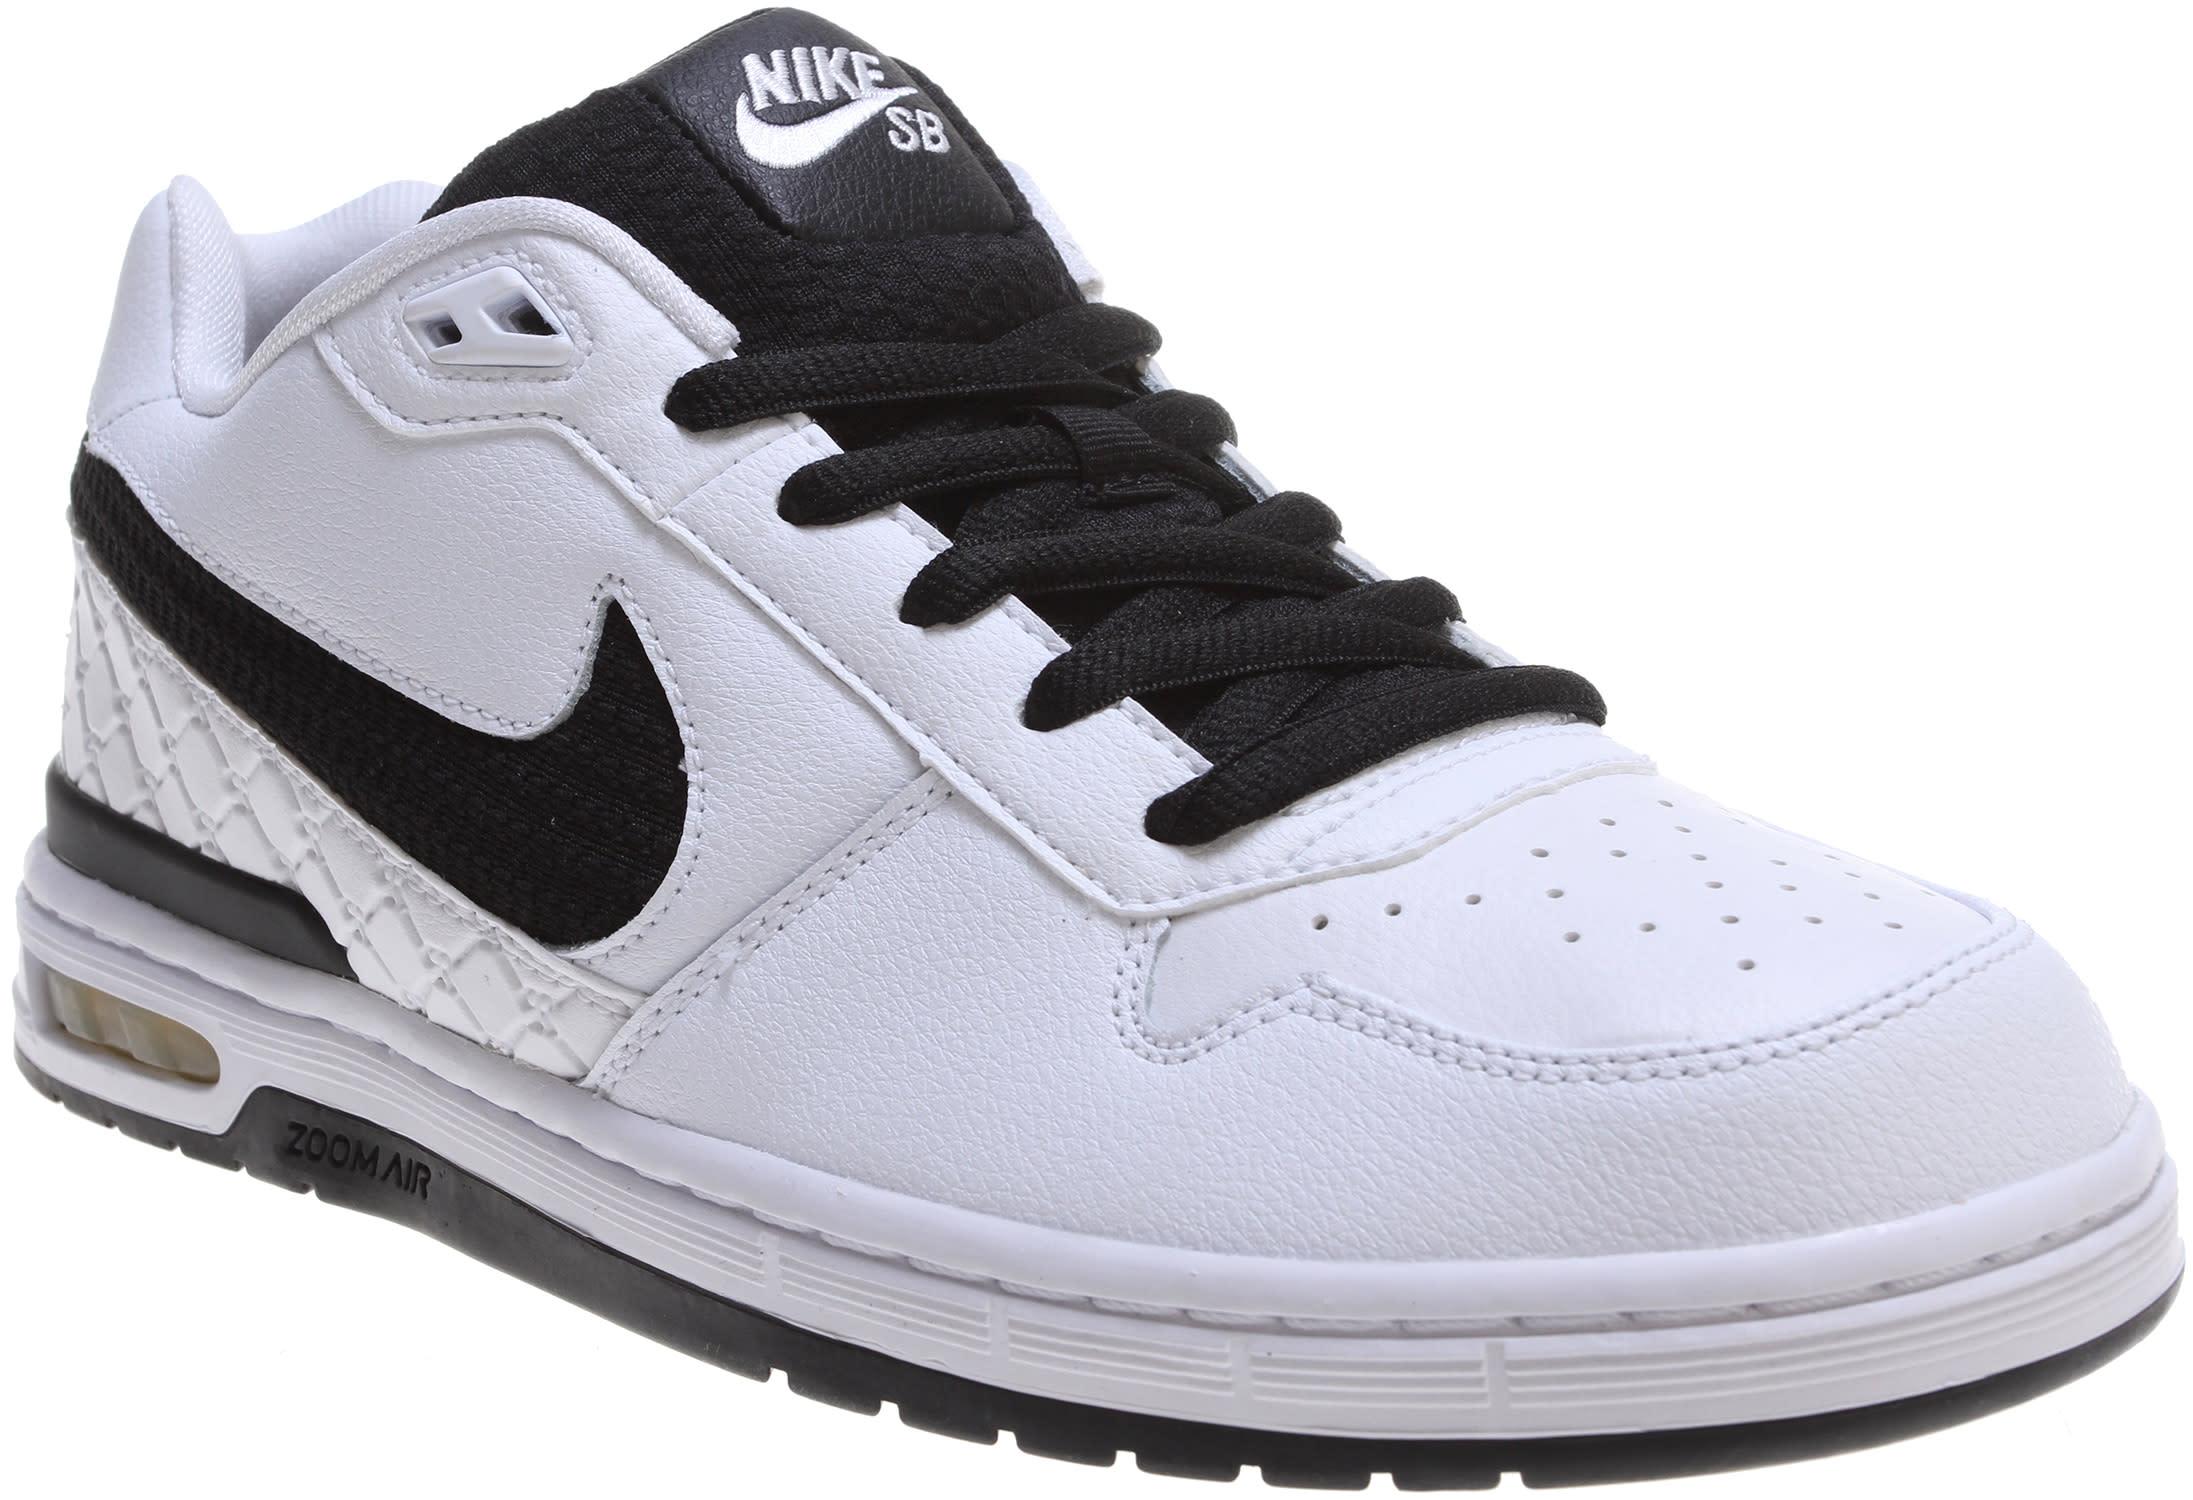 f58b5c901453 Nike Paul Rodriguez Zoom Air Low Skate Shoes - thumbnail 2